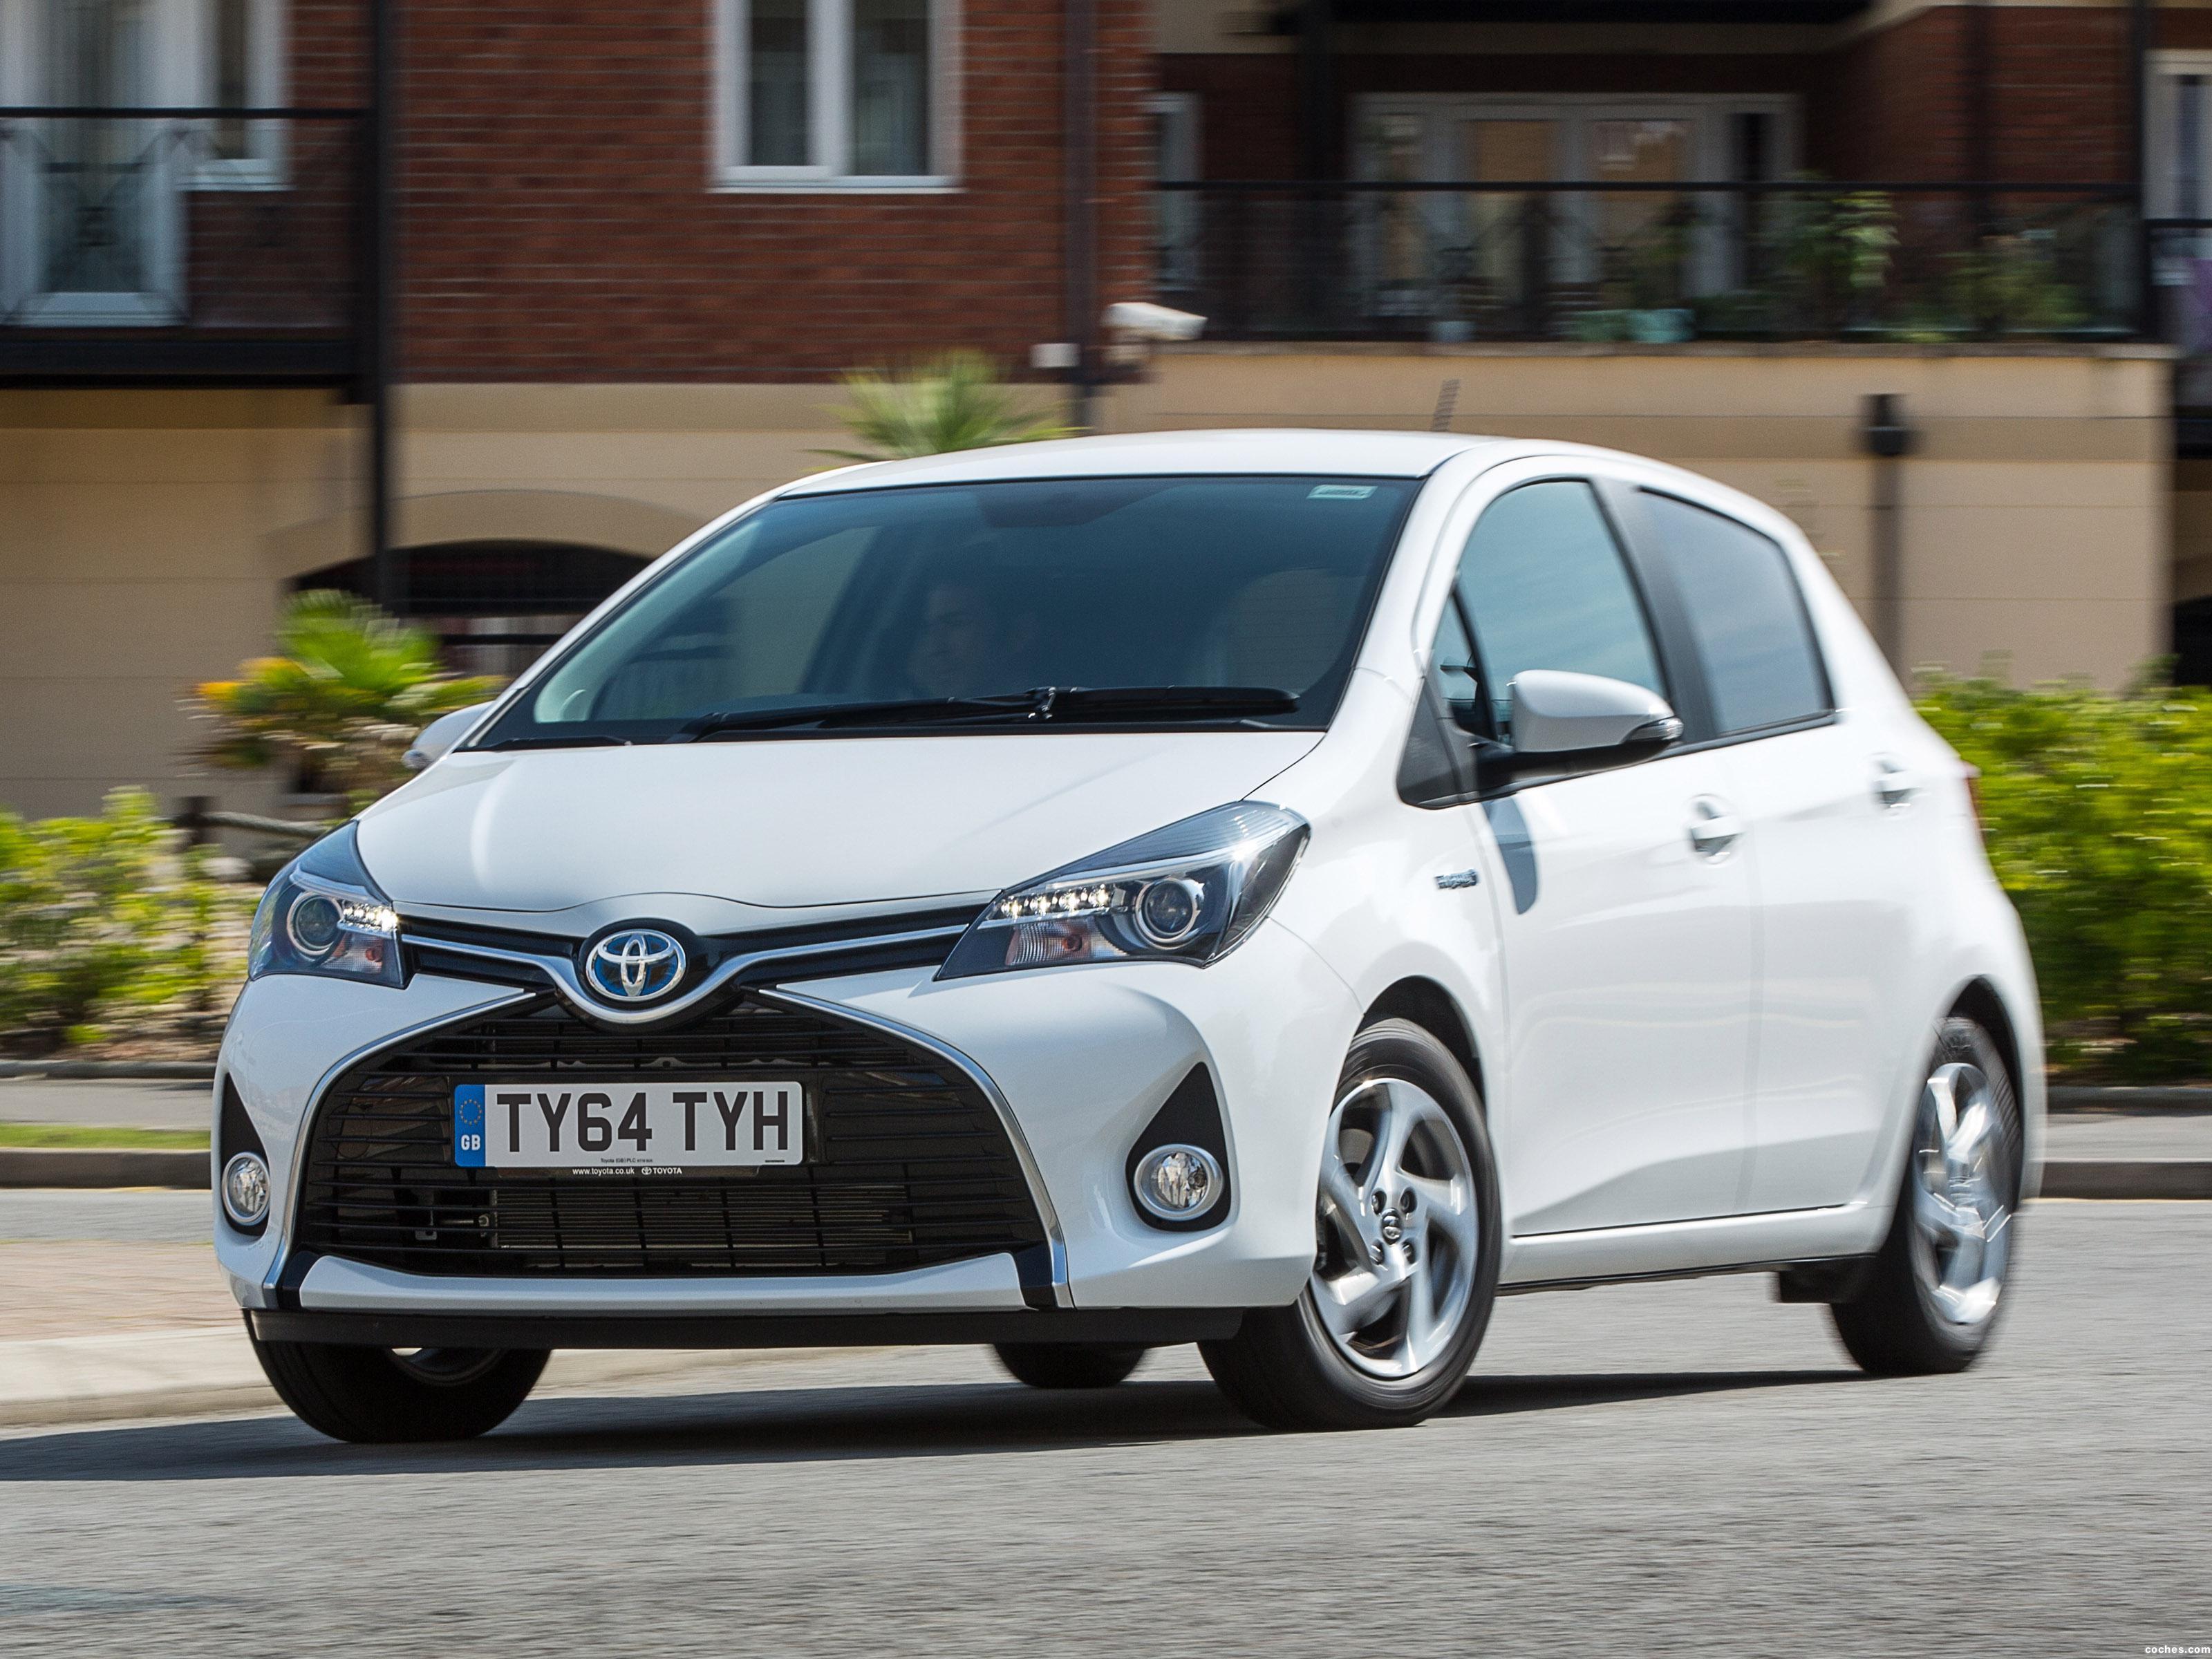 Foto 0 de Toyota Yaris Hybrid UK 2015